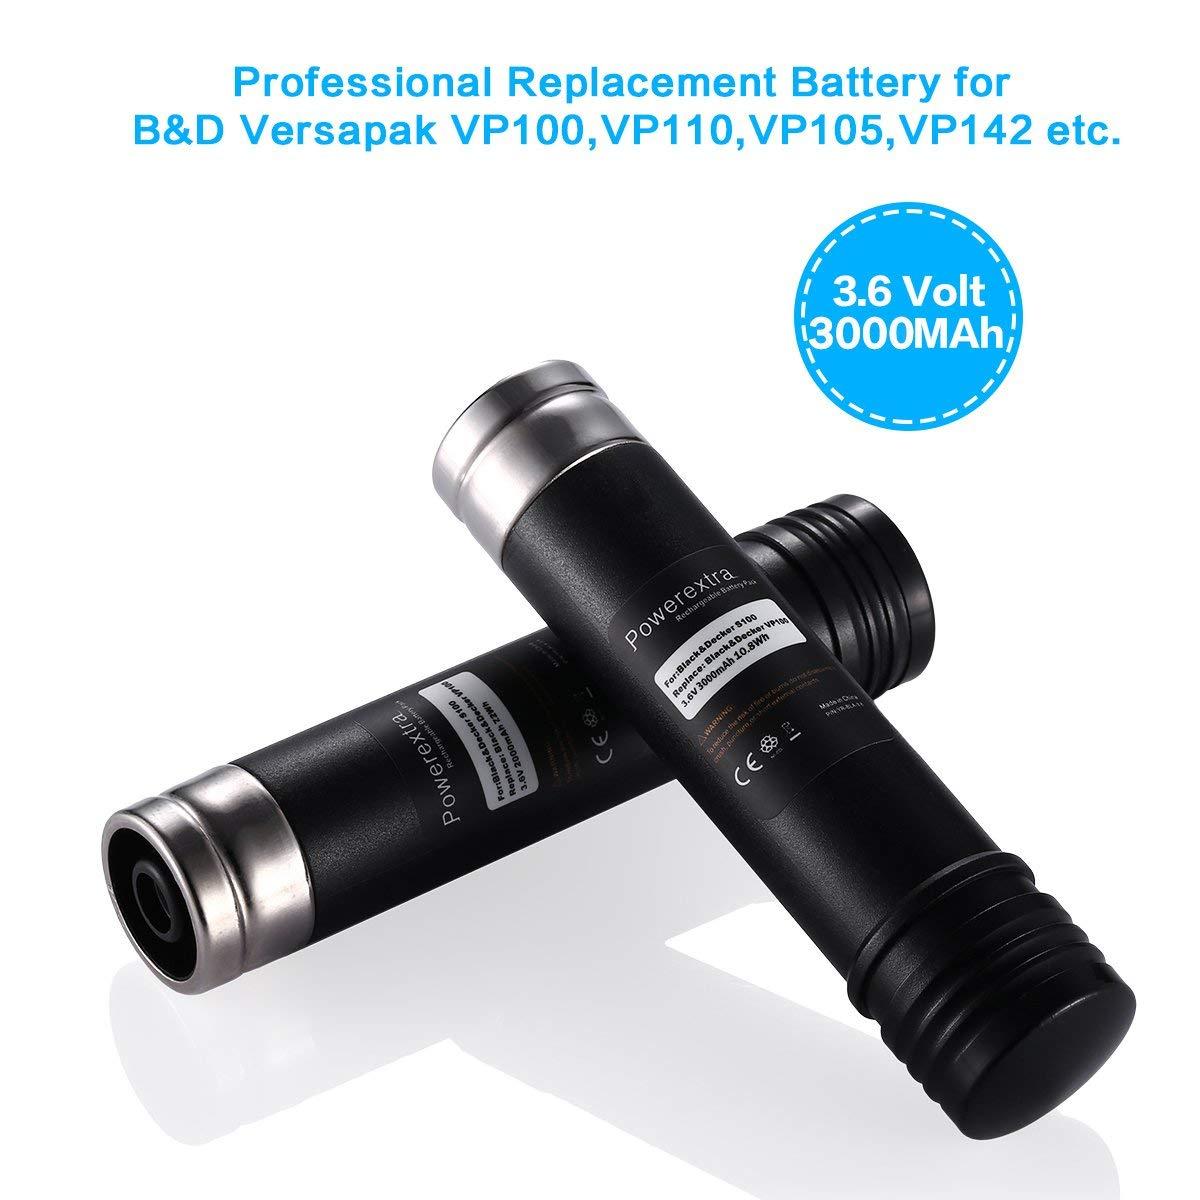 Powerextra 2.0Ah 3.6V 2 Pack Replacement Battery for Black&Decker Versapak Vp100 Vp105 Vp110 Vp142 Vp143 Vp7240 Sears-Craftsman Pivot180 PLR36NC S100 S110 151995-03 387854-00 383900-03